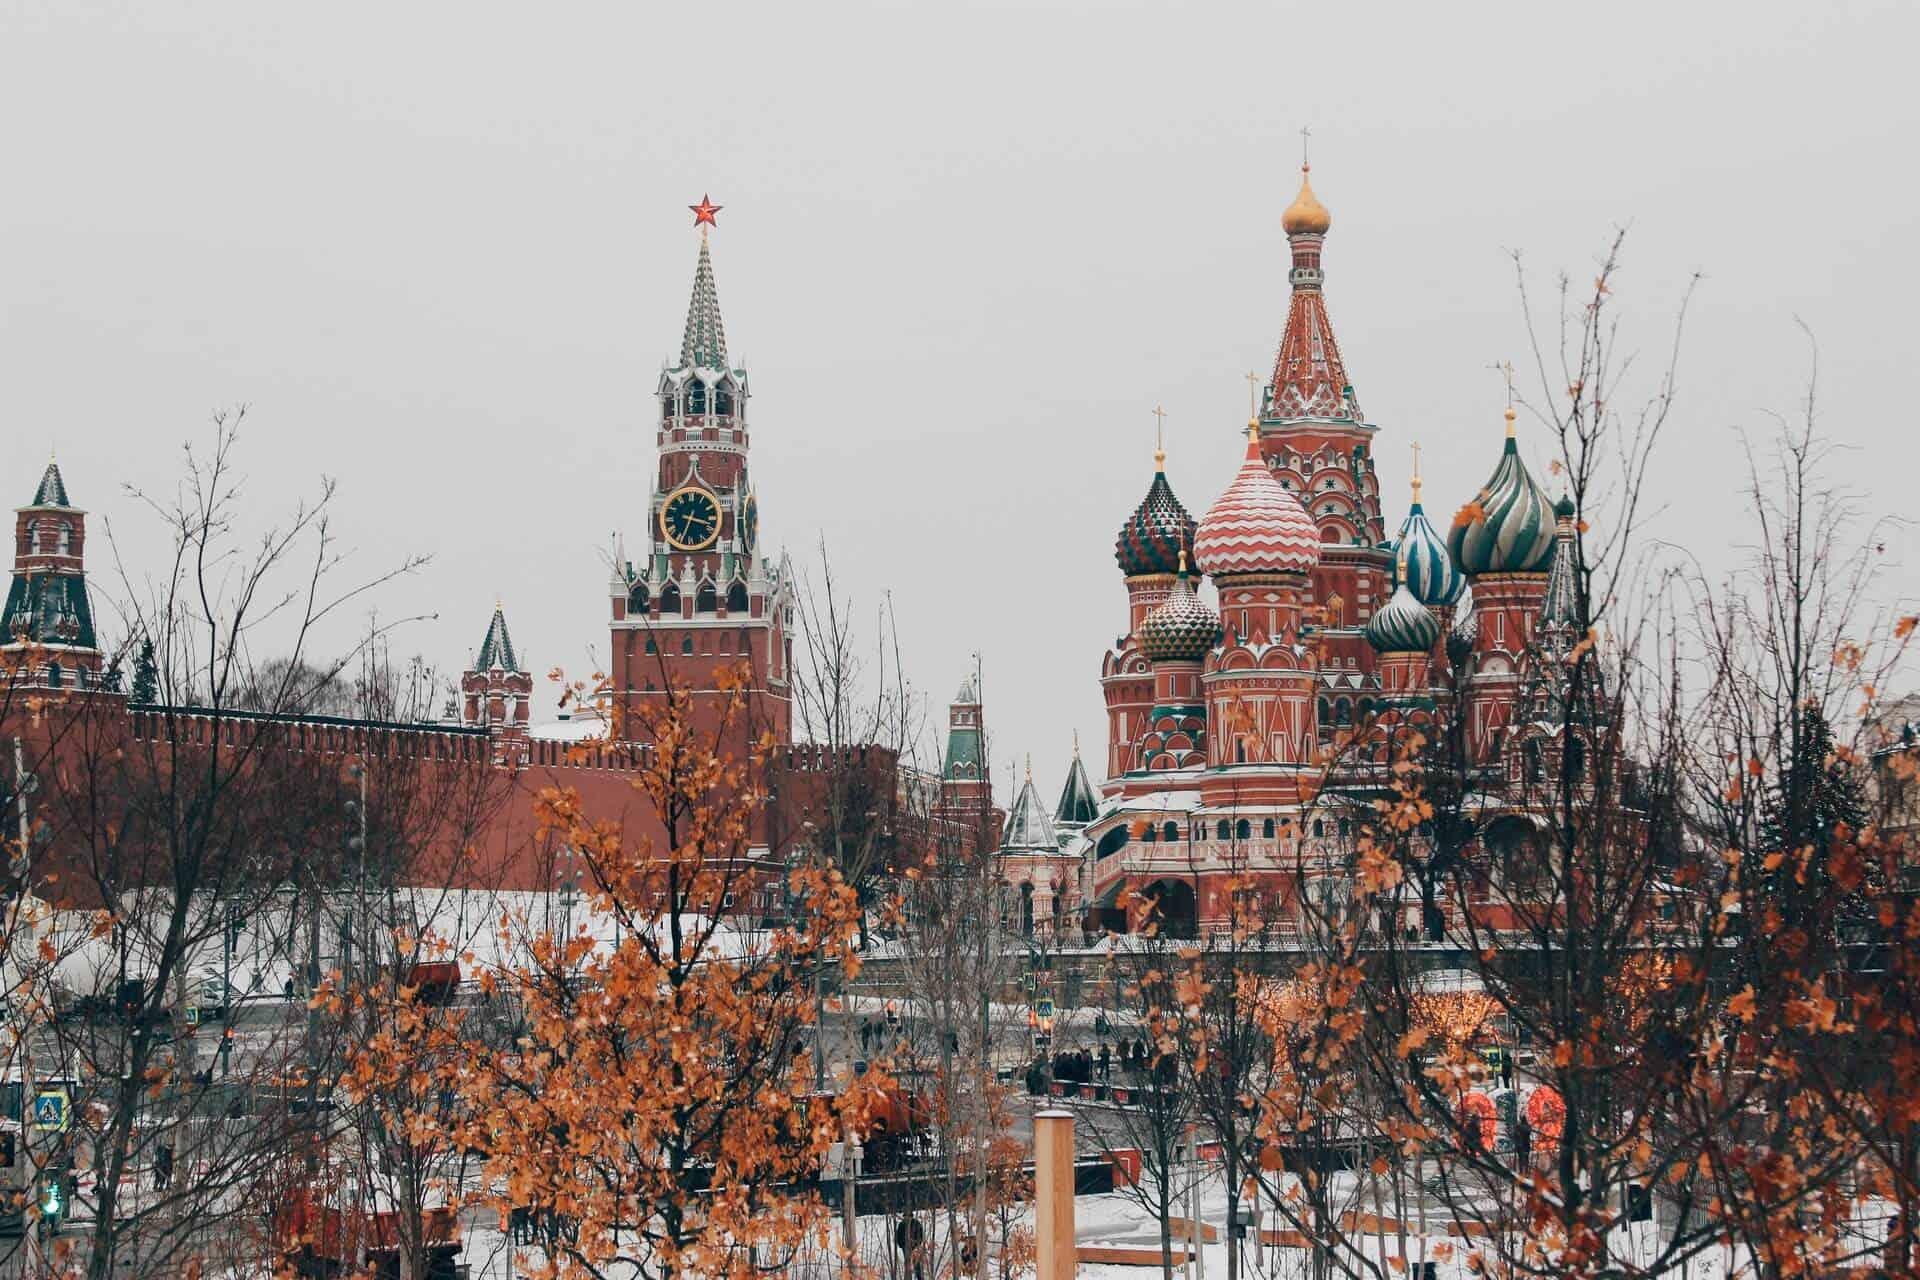 Gratis en Moscú